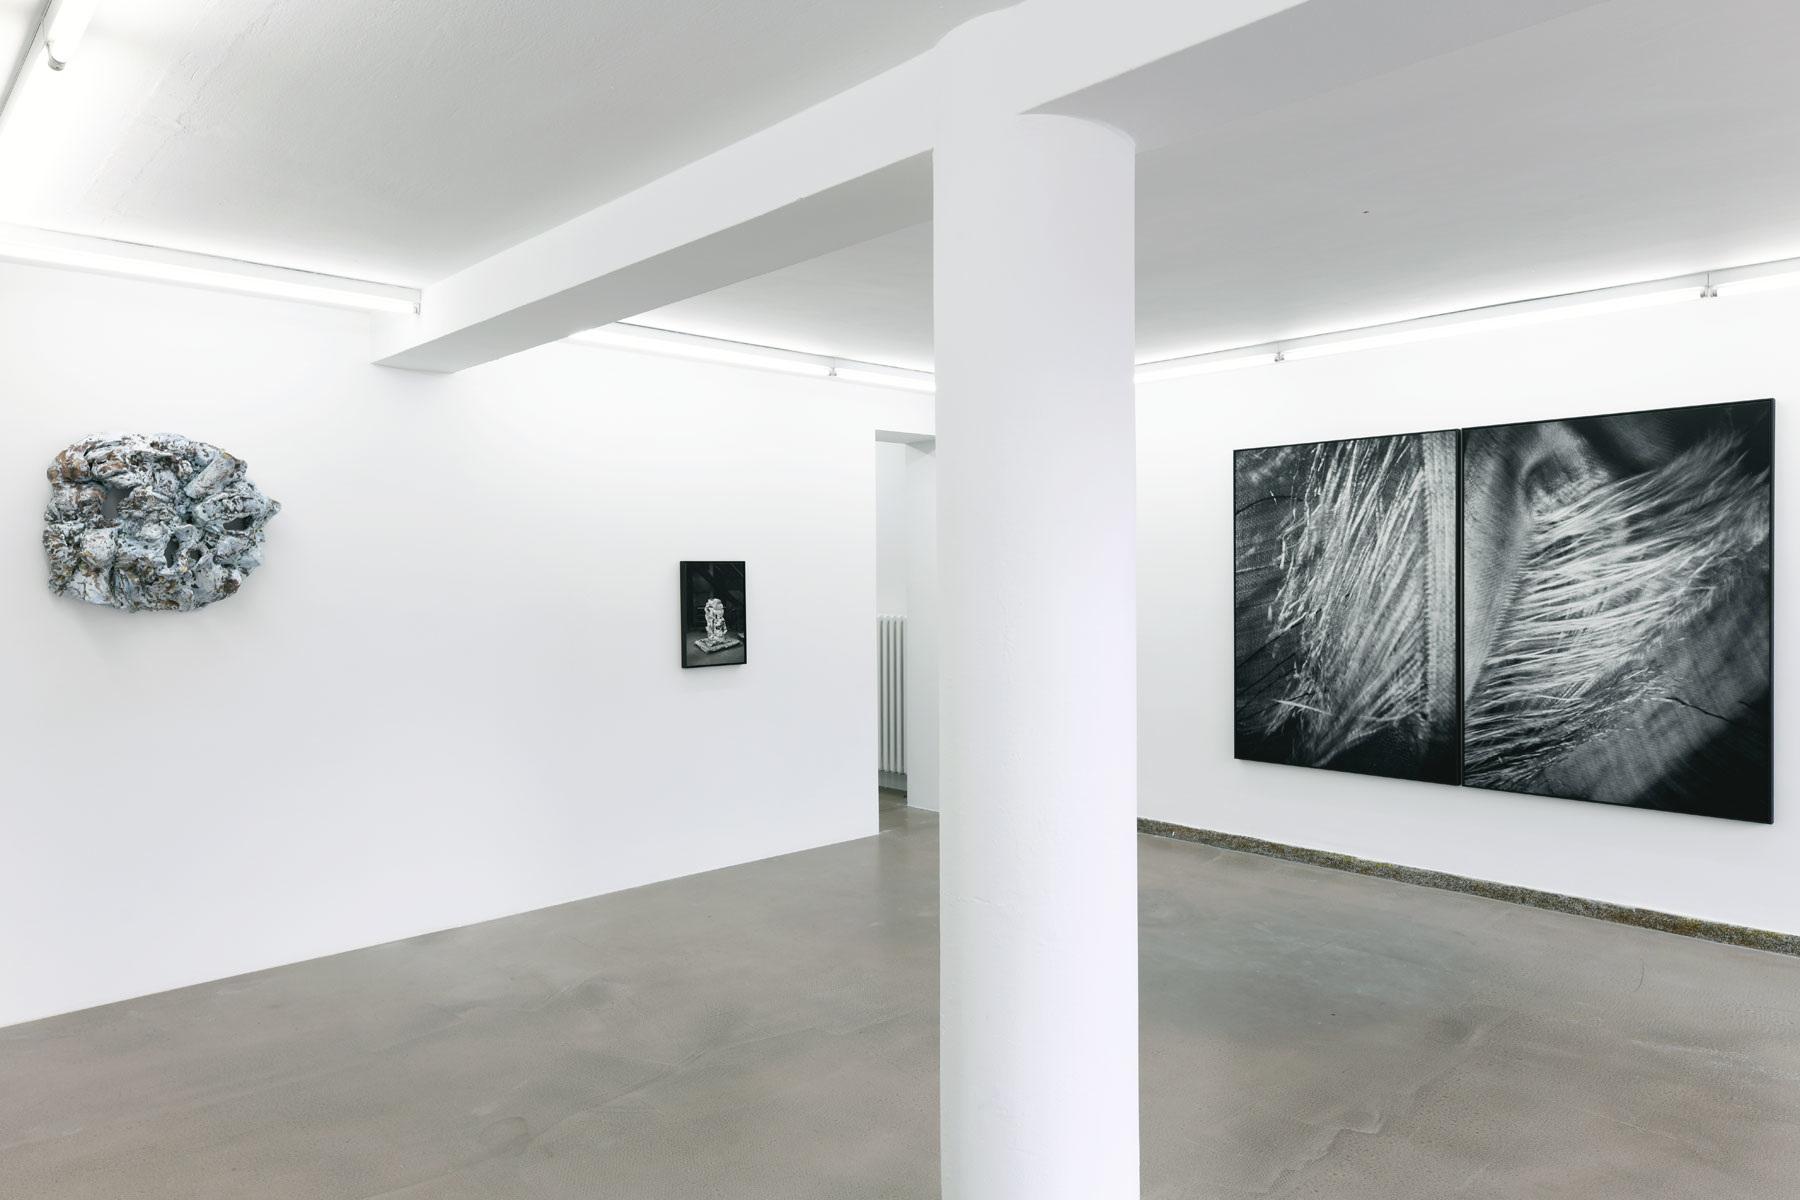 Karweick_Moritz_temperate-solidity_installation-view_2019_09